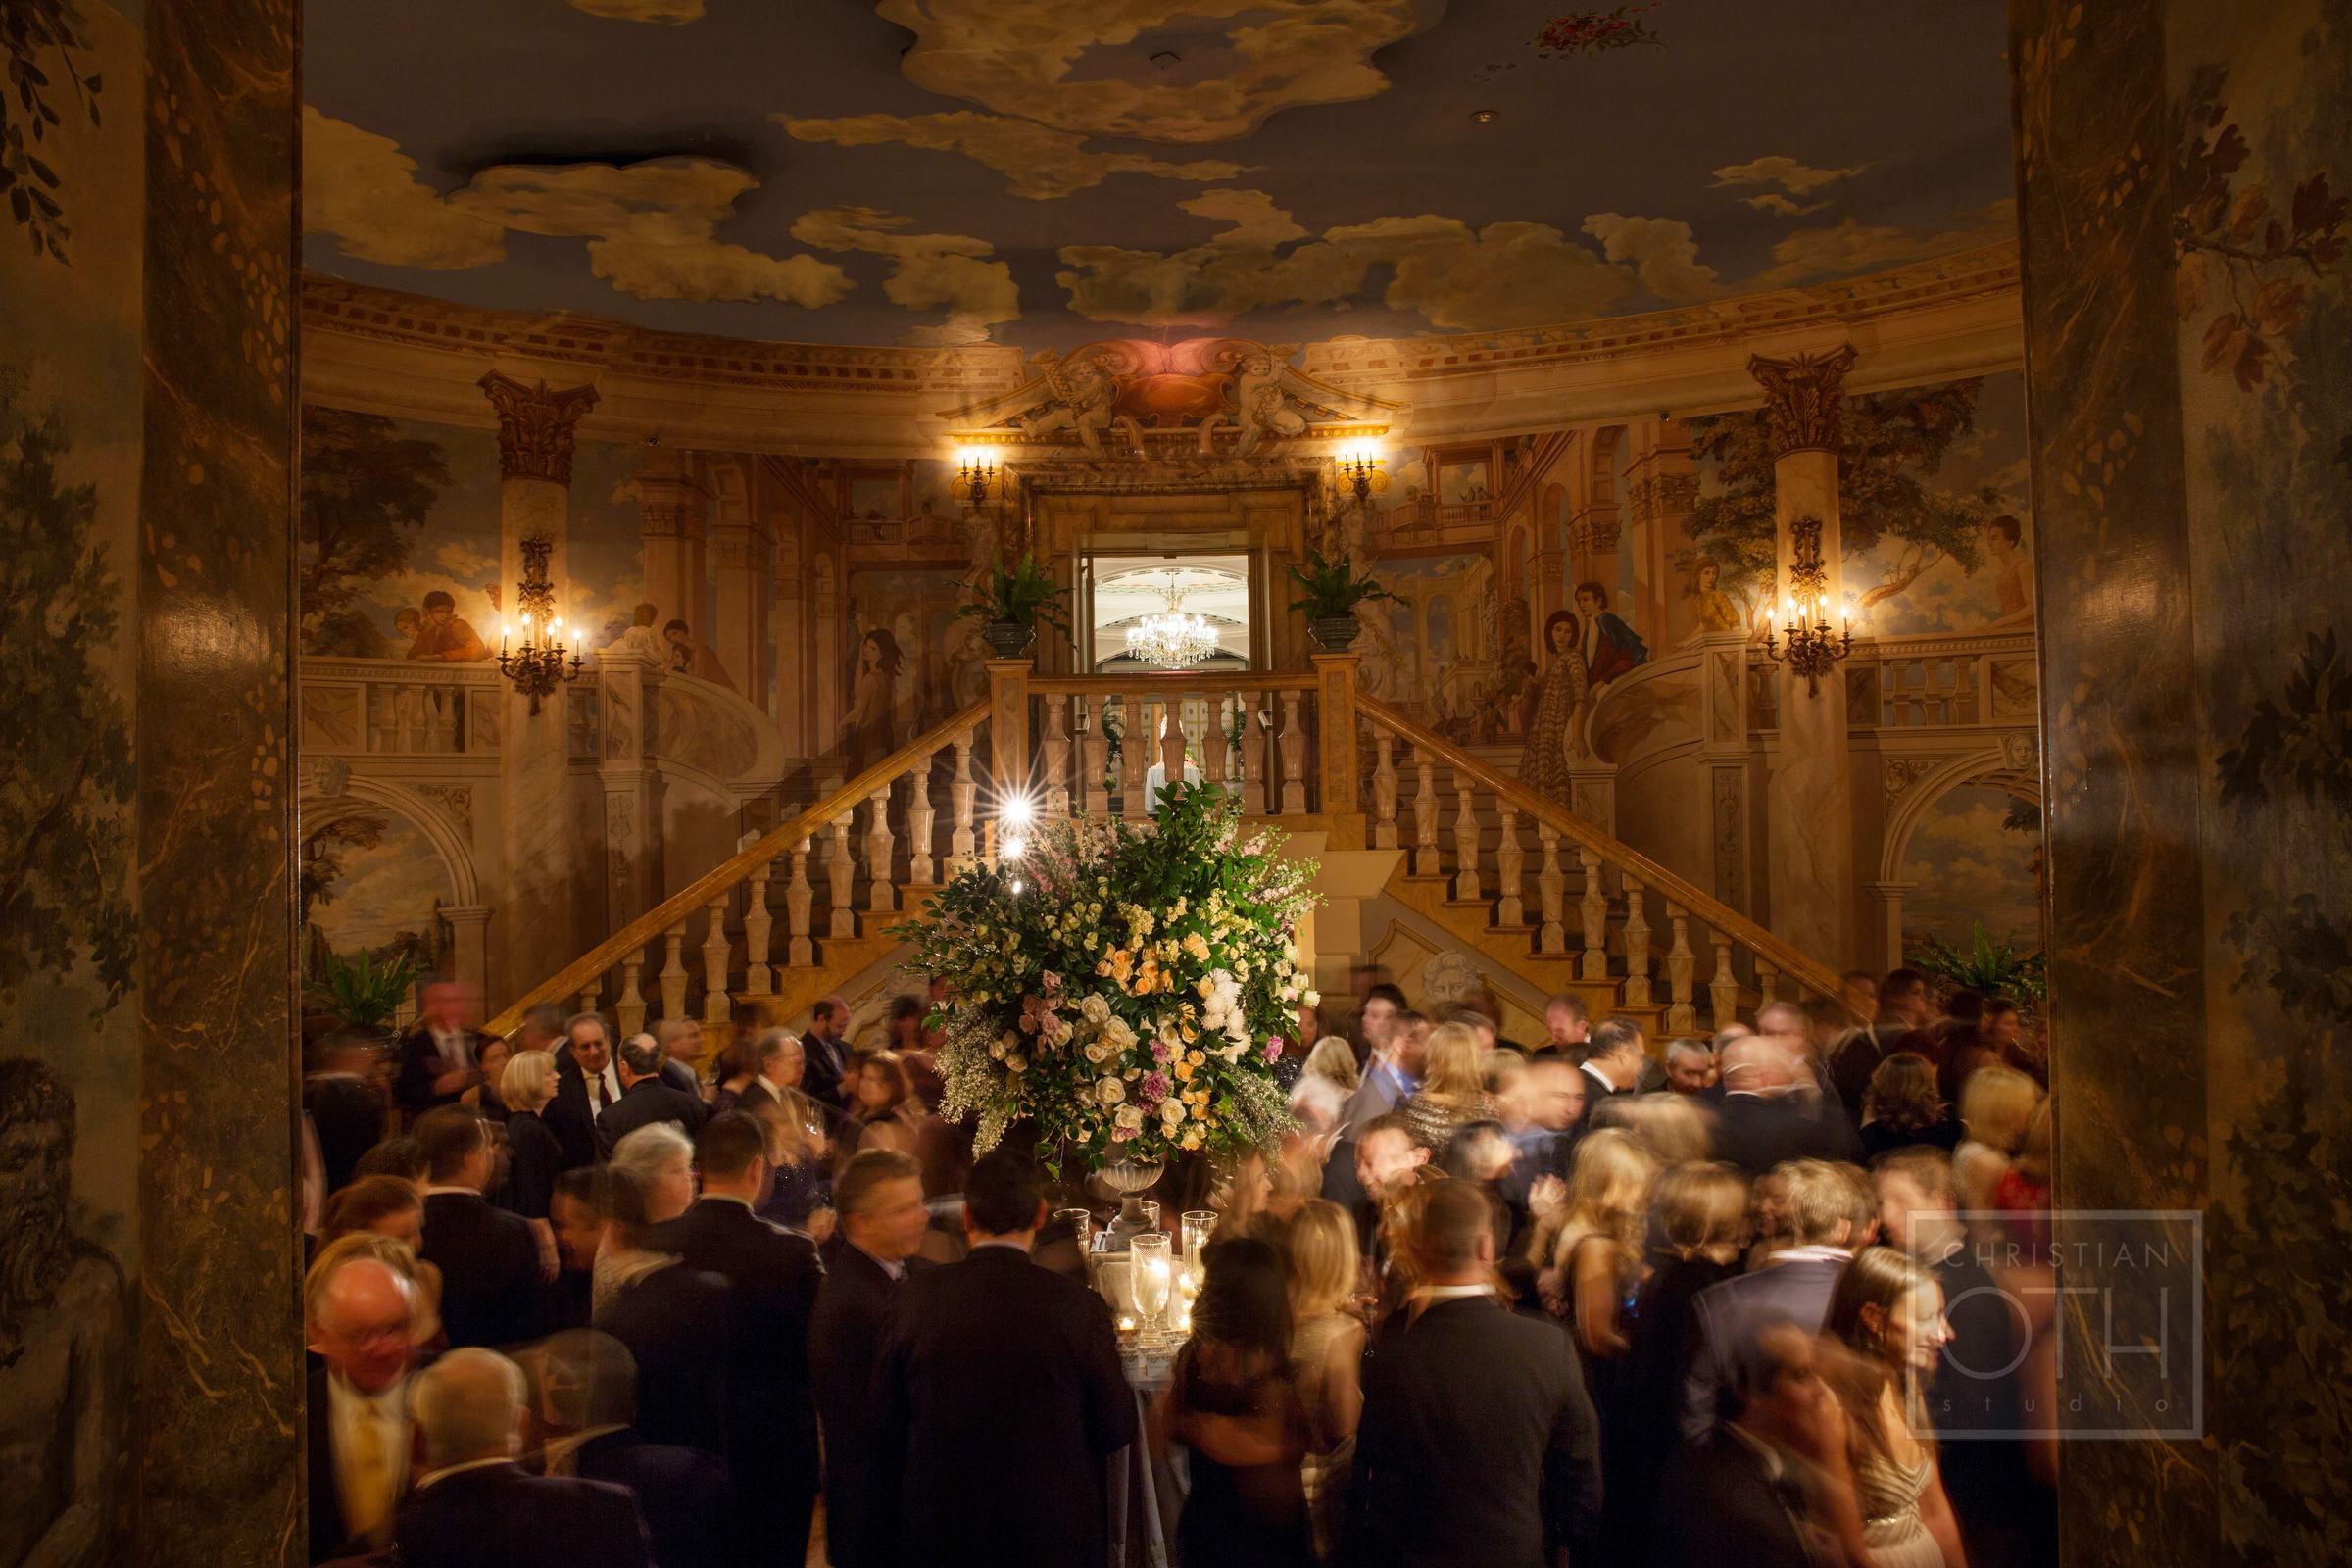 Ceci_New_York_Custom_Invitation_Pierre__City_ Destination_Wedding_Luxury_Personalized_Ceci_Style_Bride_Rose_Gold_Foil_Stamping81.JPG